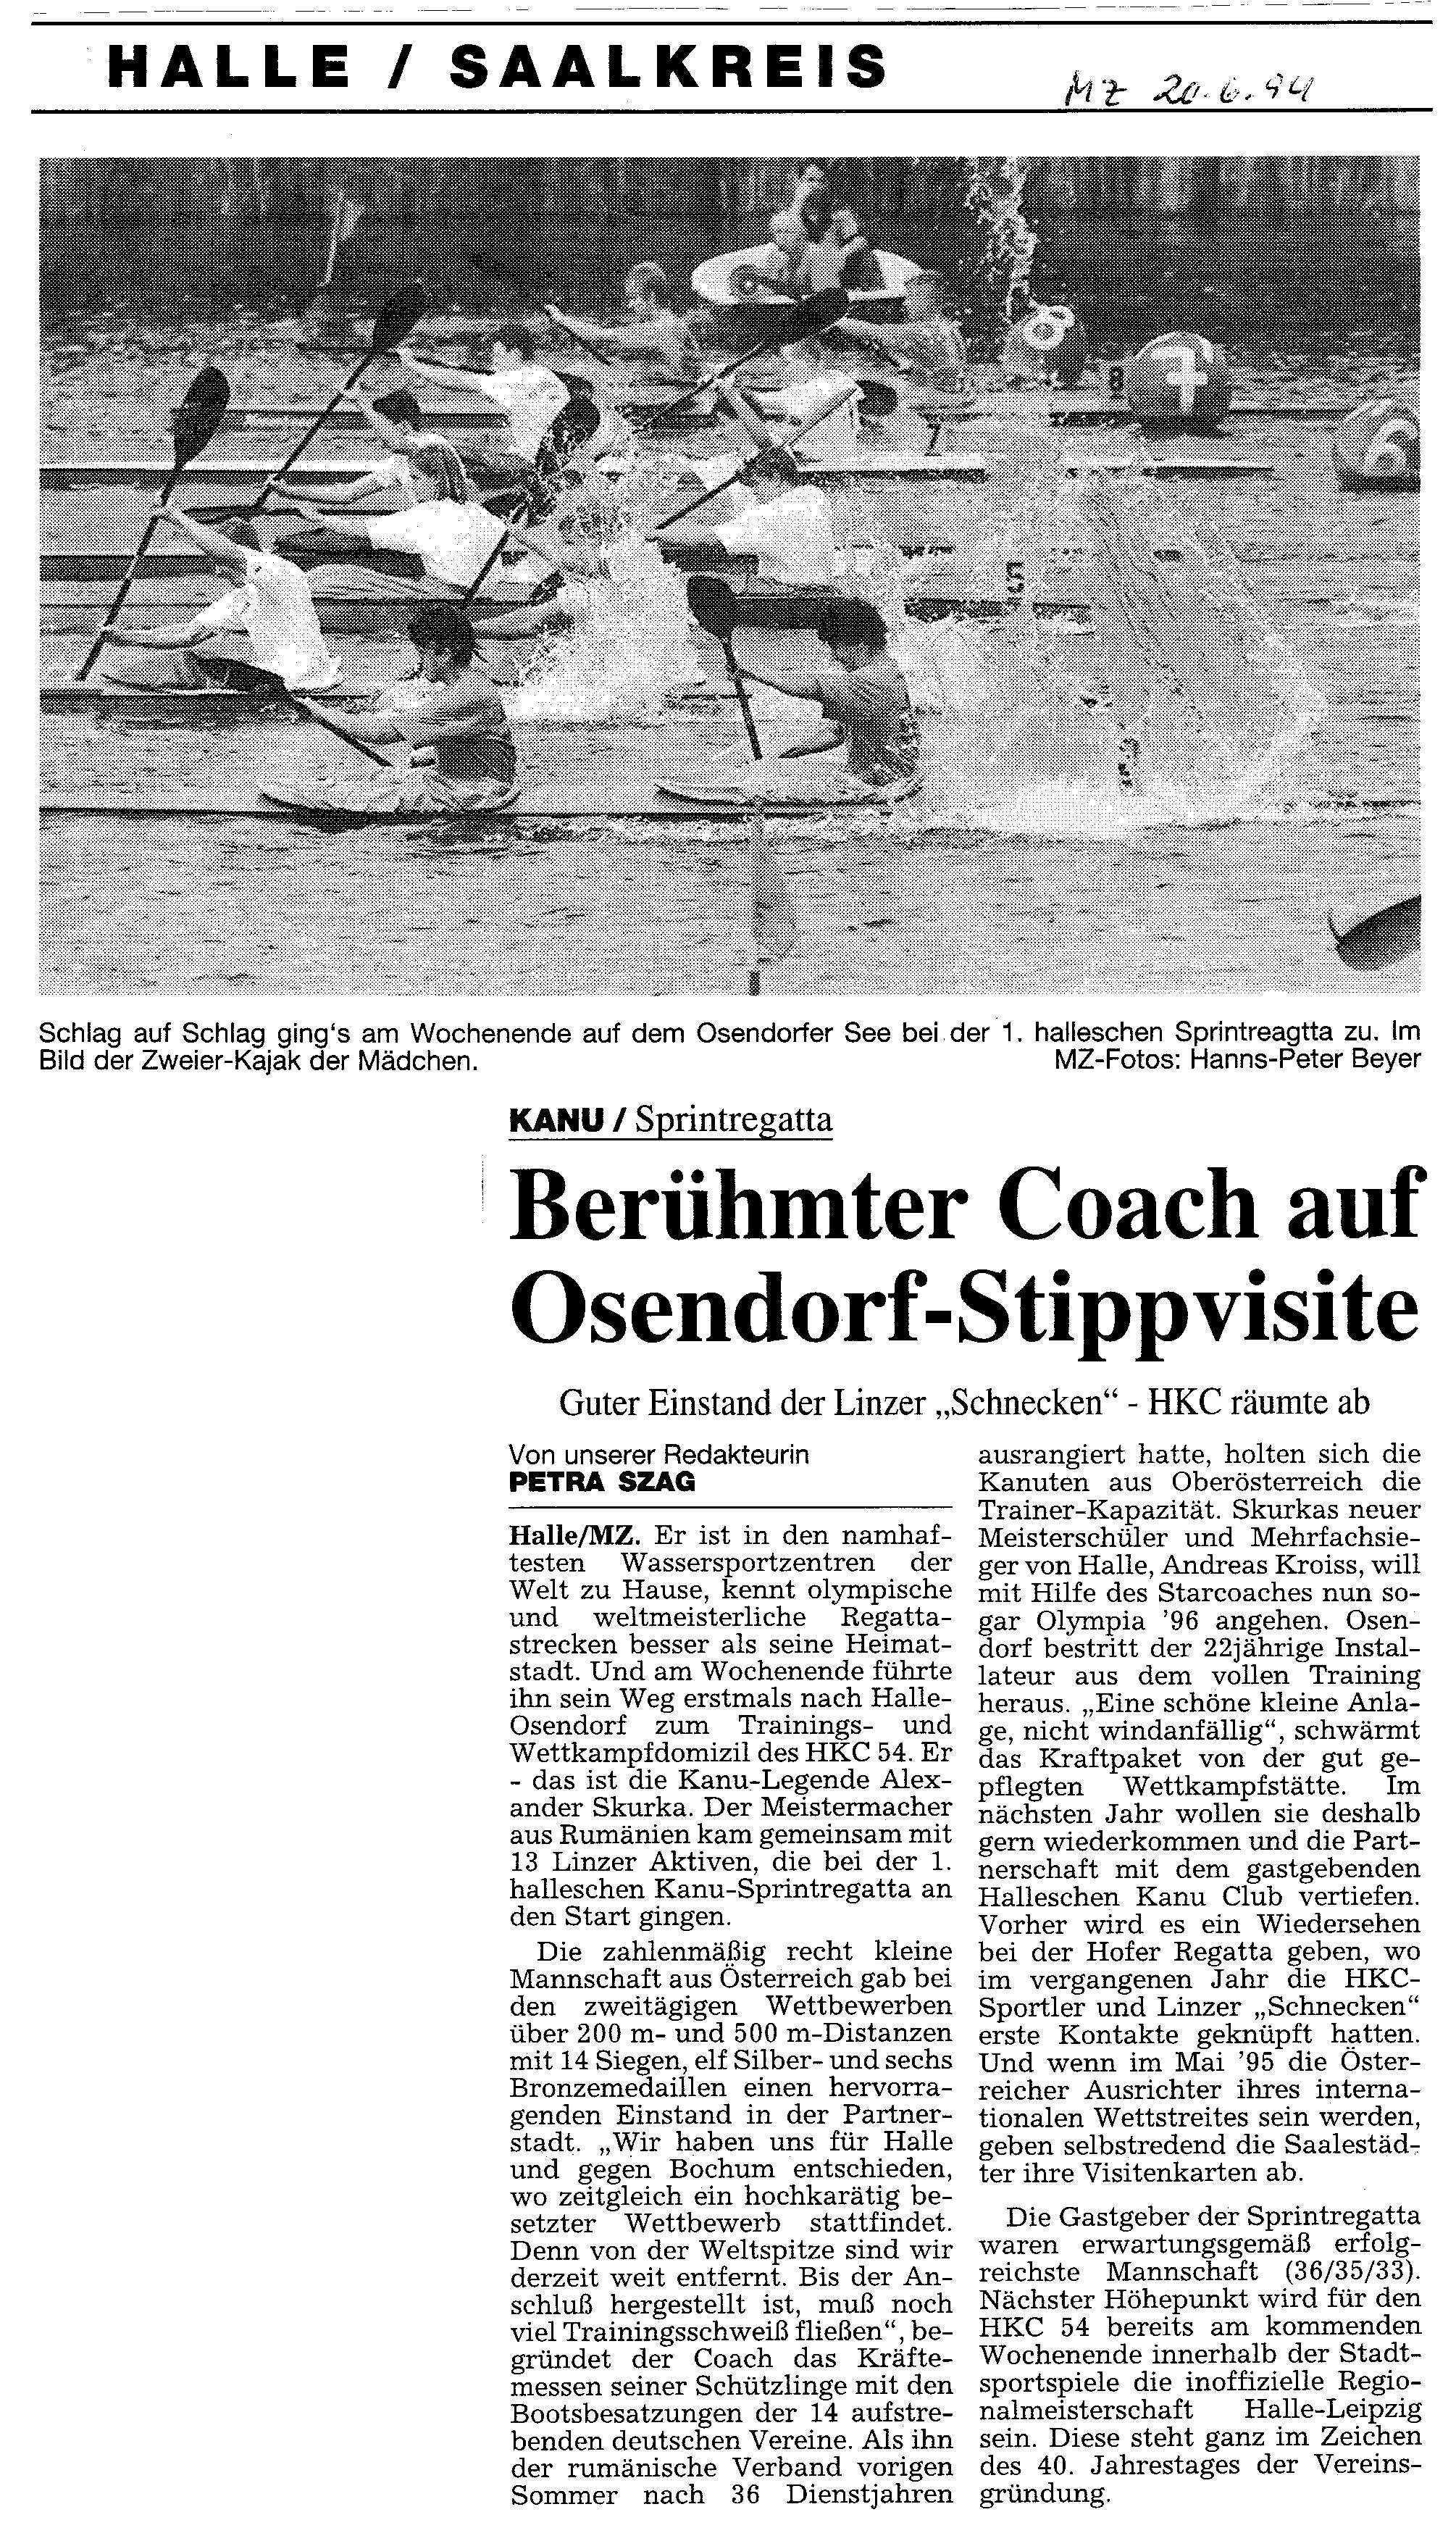 1994-06-20 MZ Berühmter Coach auf Osendorf-Stippvisite